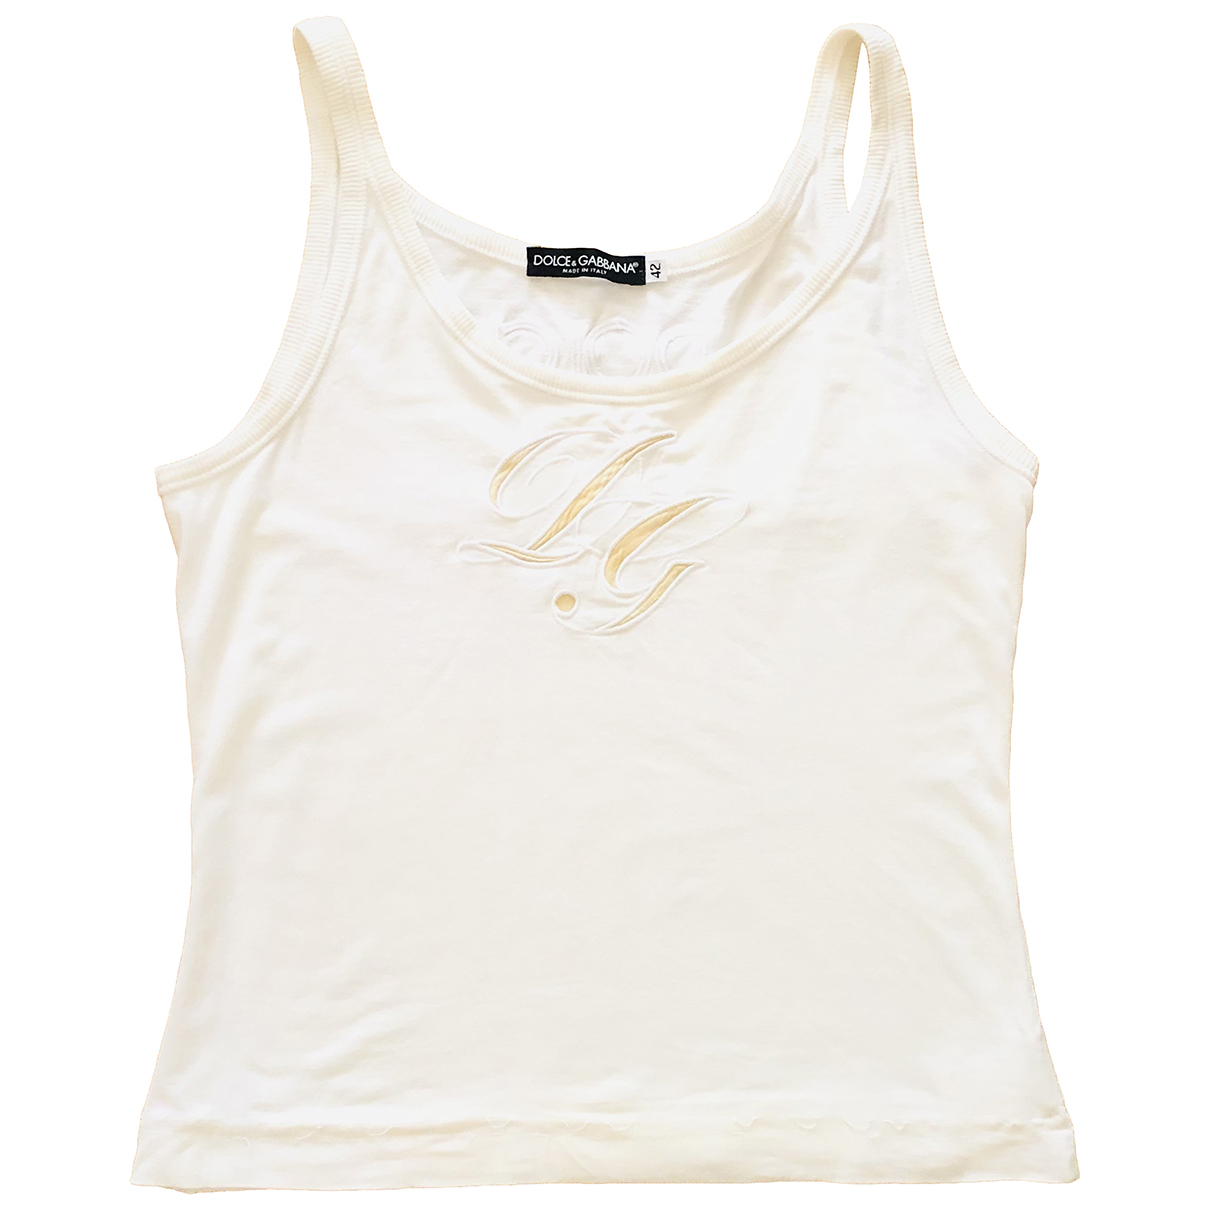 Dolce & Gabbana N White Cotton  top for Women 42 IT